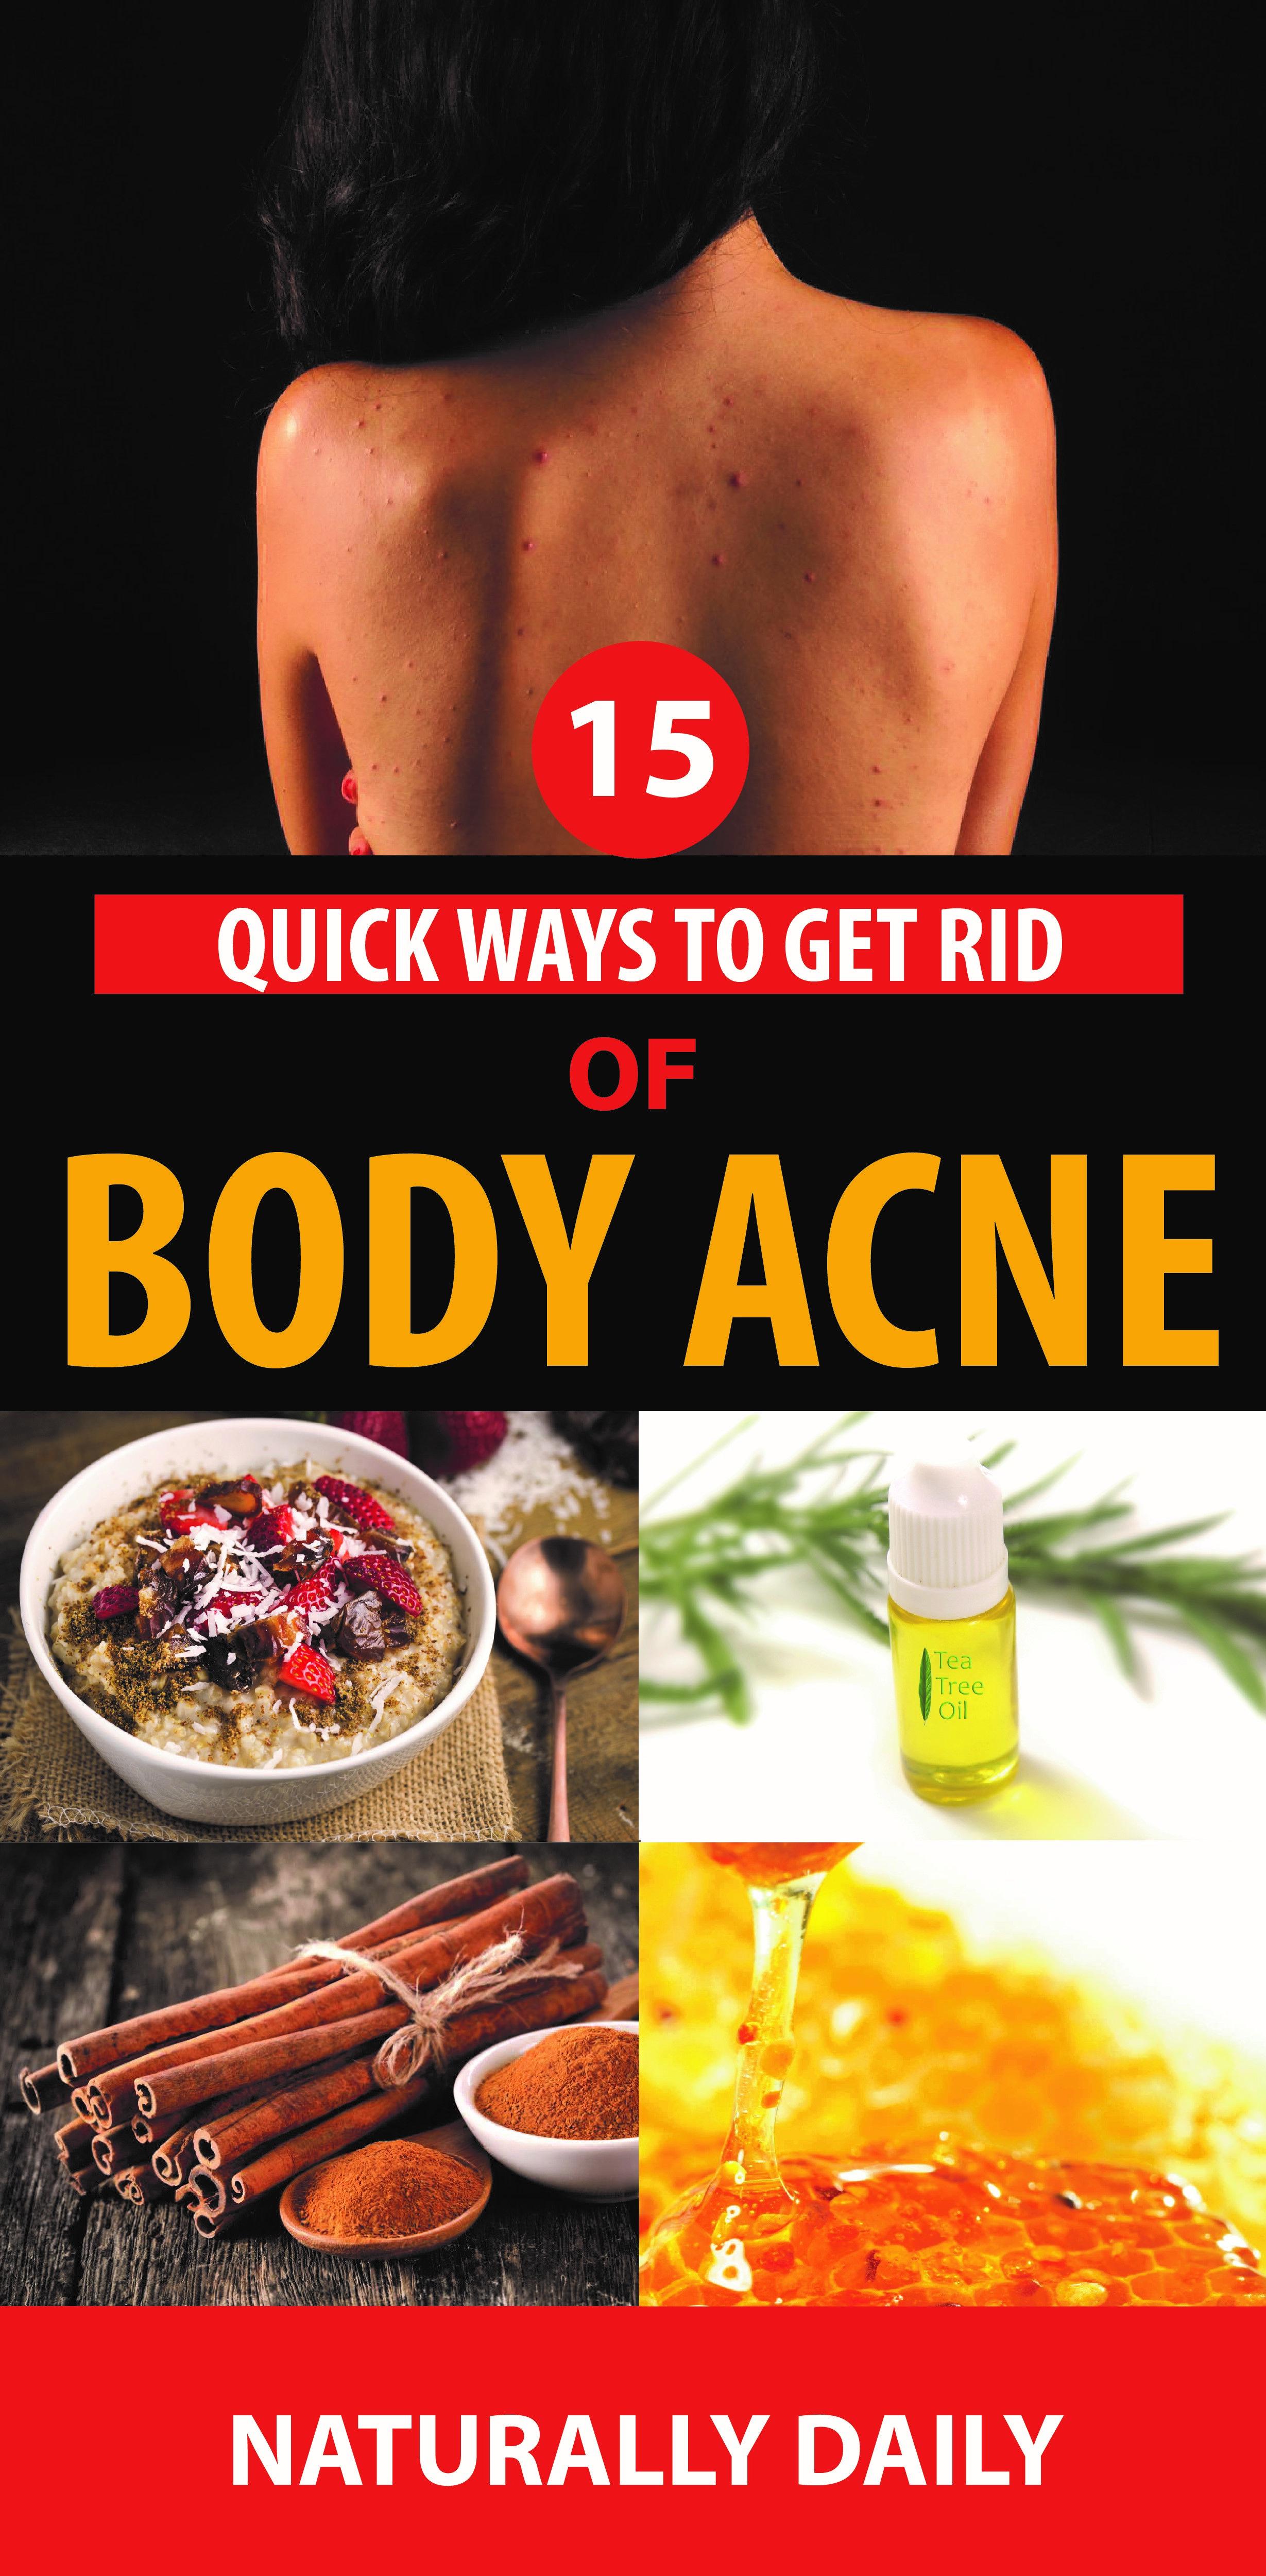 15 quick ways to get rid of body acne body acne skin